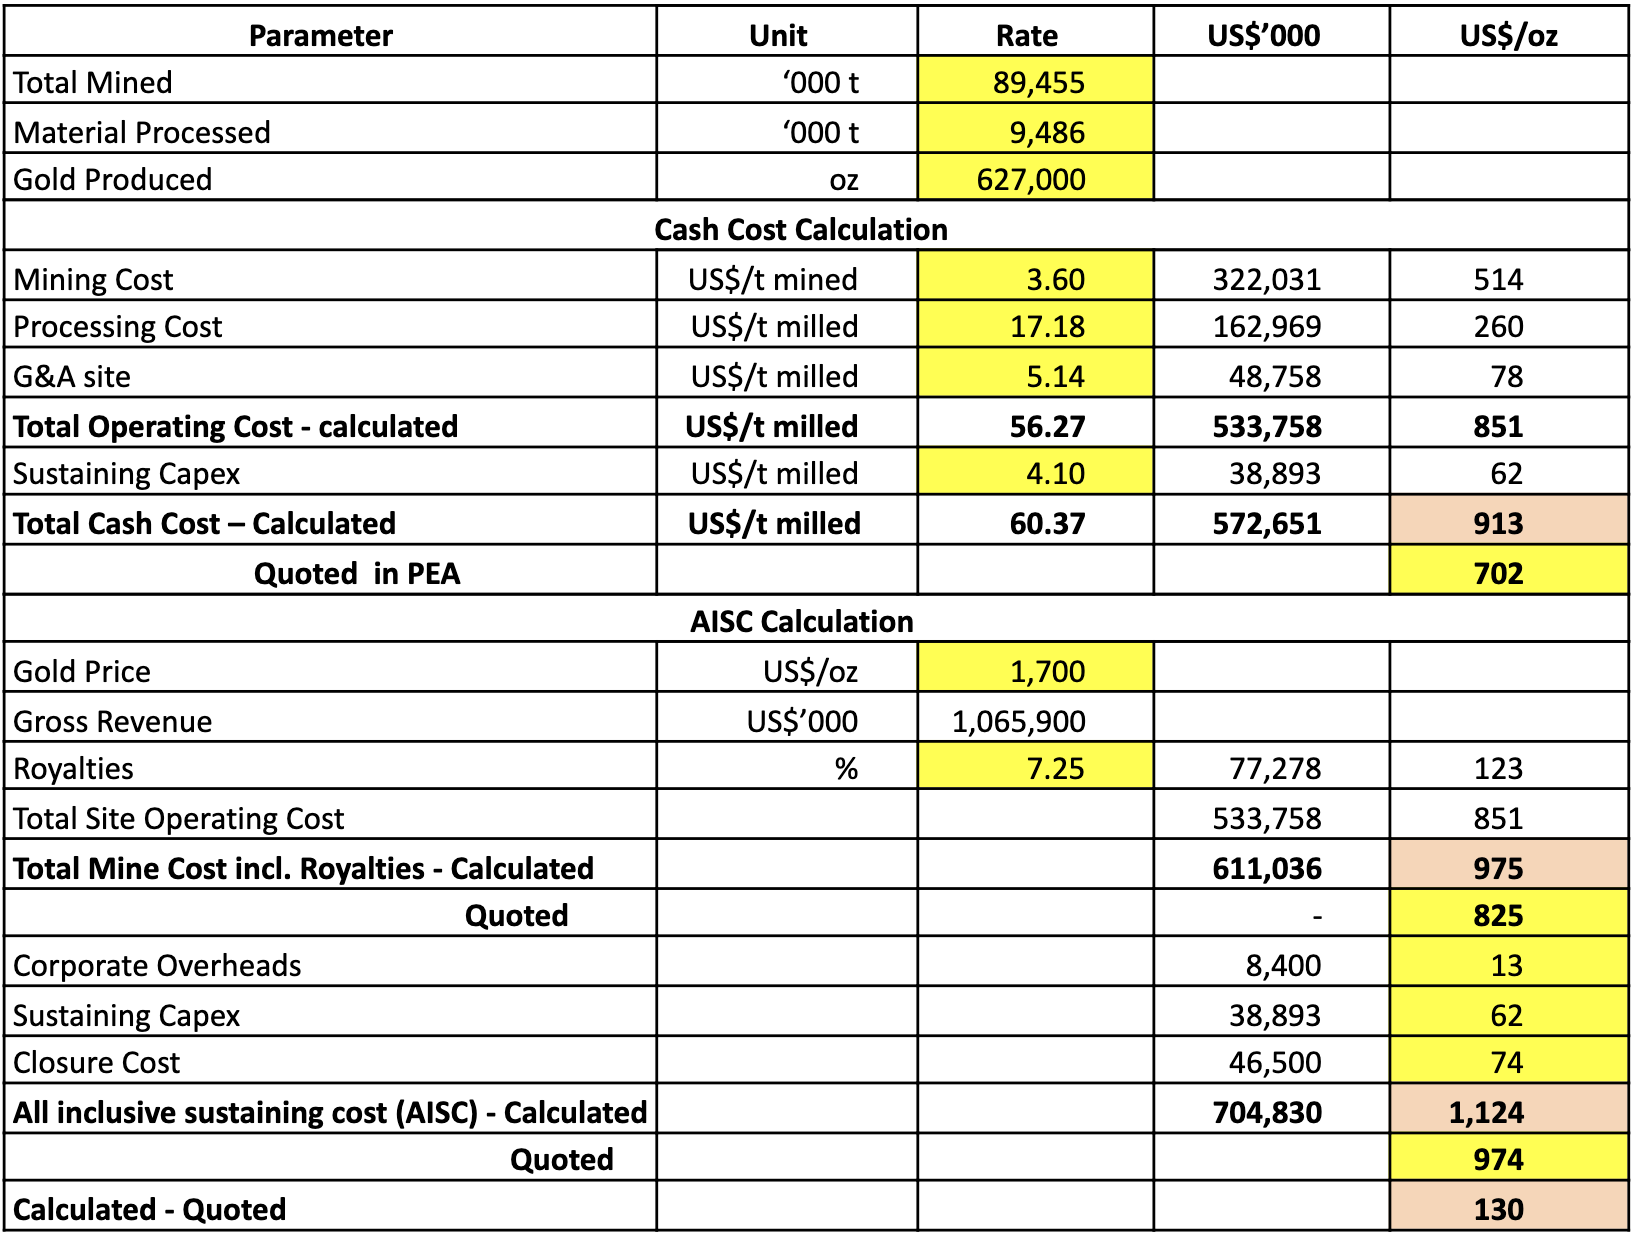 Novo Resources Corporation Discrepancies in Costing